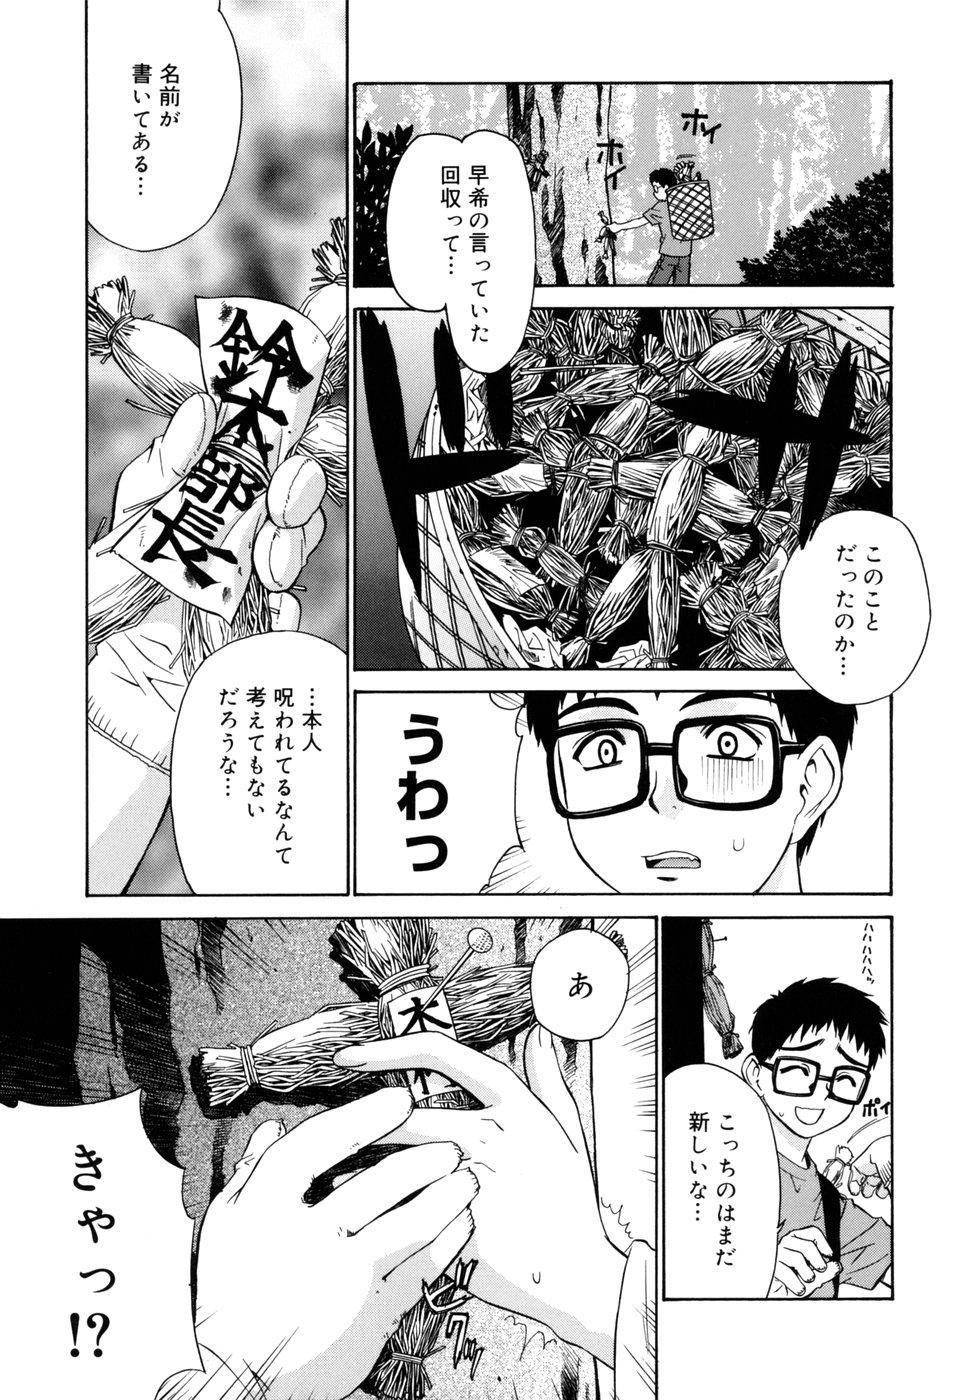 [Yaya Hinata] Tonari no Miko-san wa Minna Warau - The next shrine maidens smile in everyone. 24